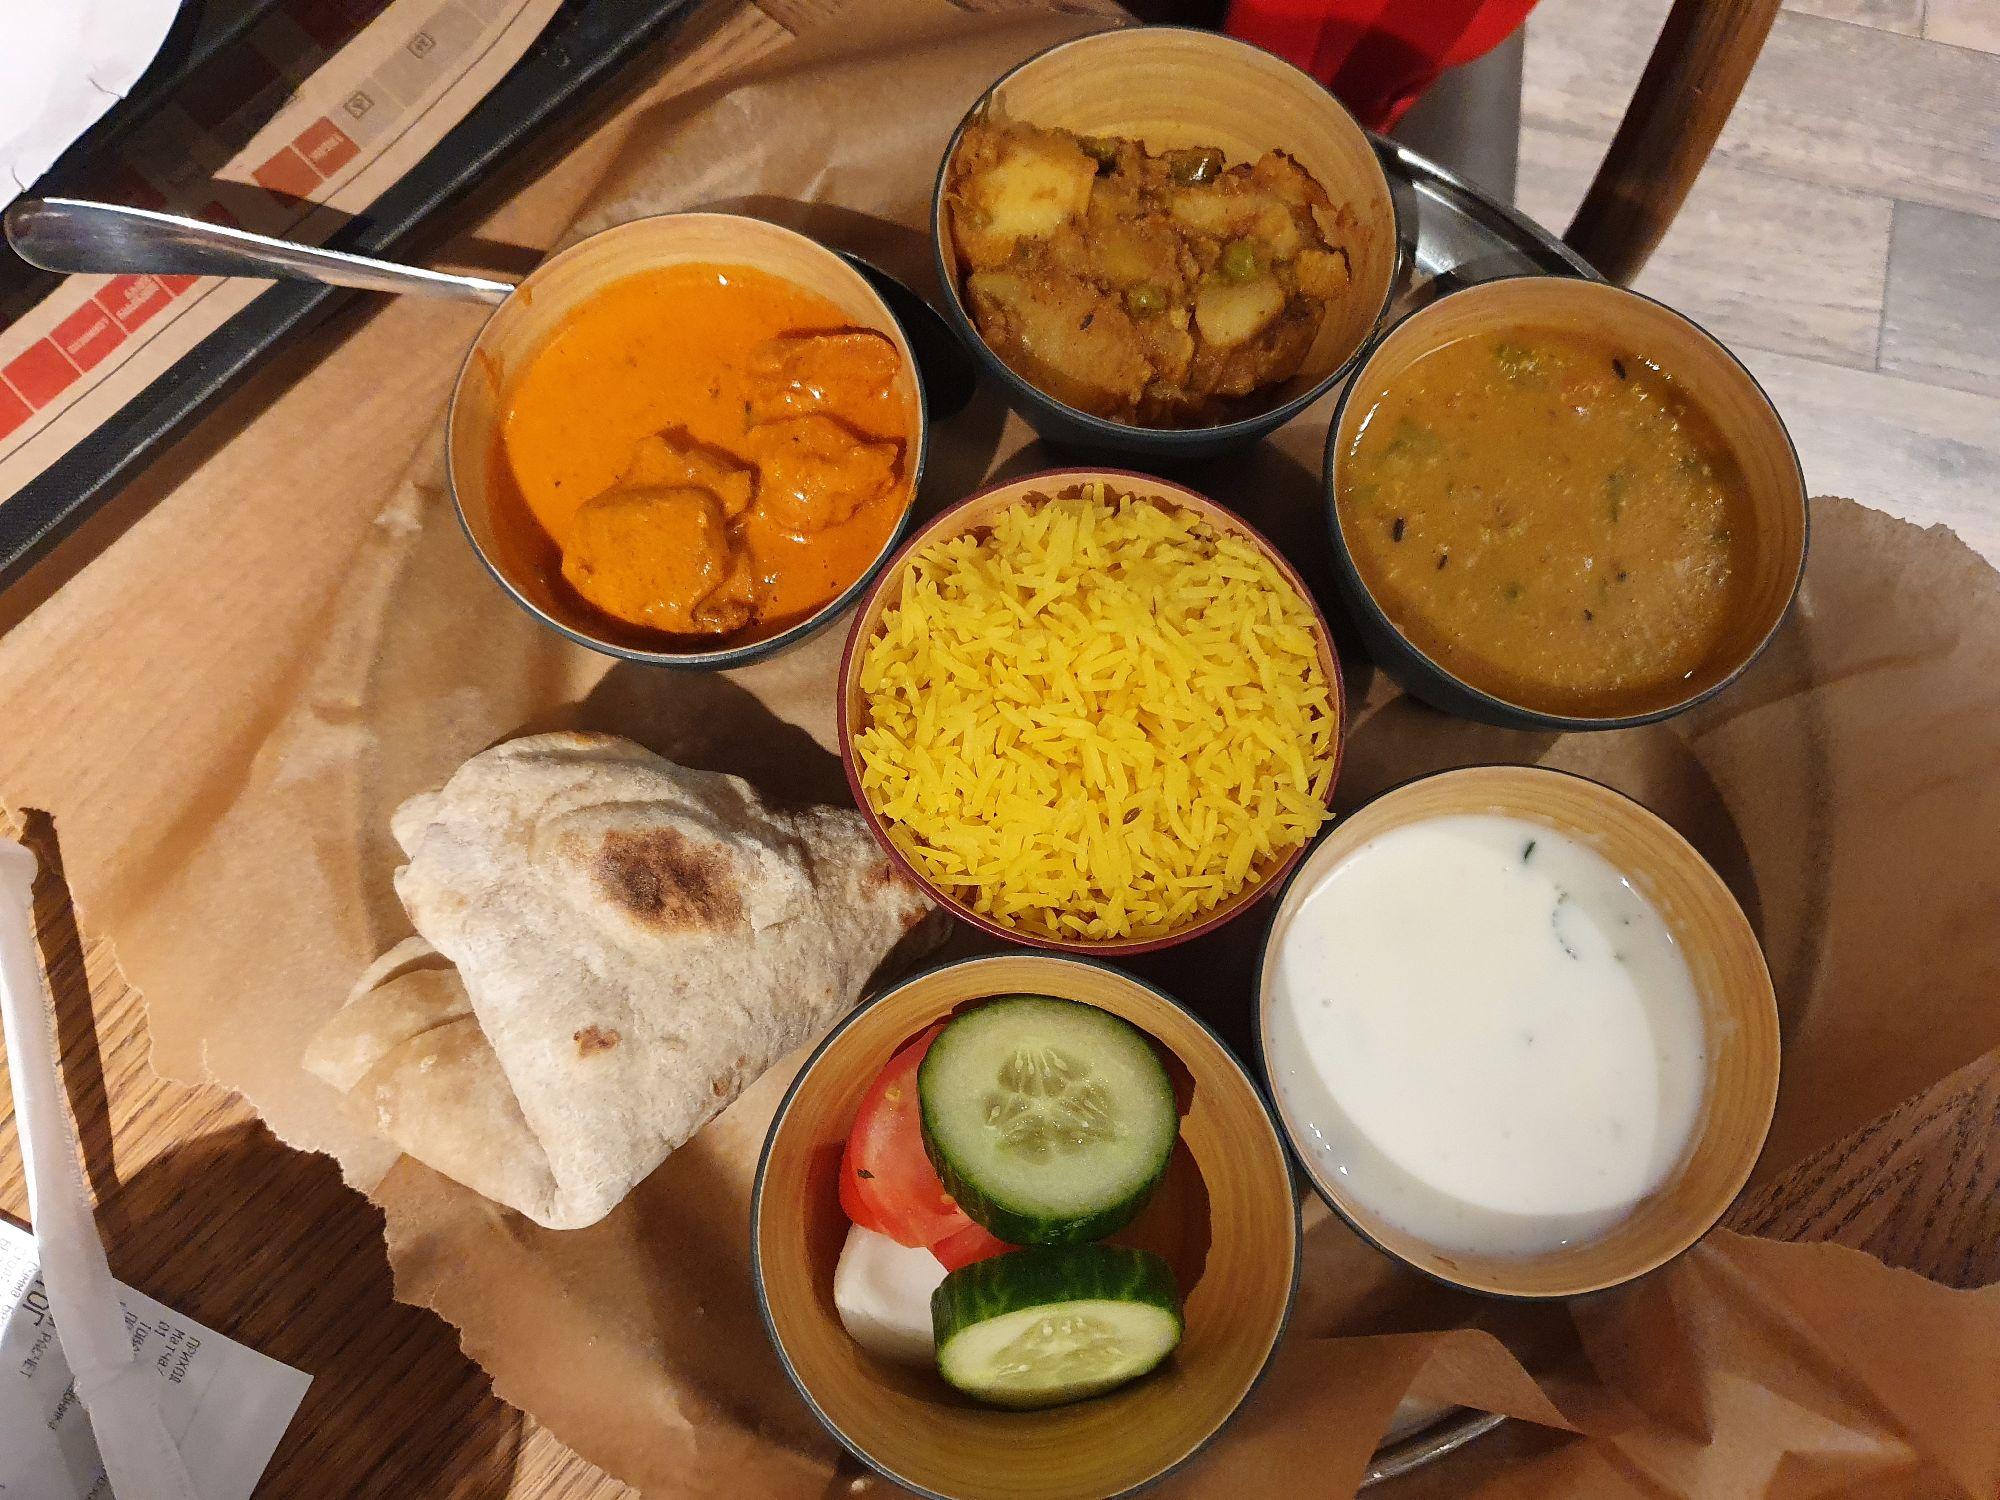 Тхали (тали) - рис, хлеб наан и несколько соусов